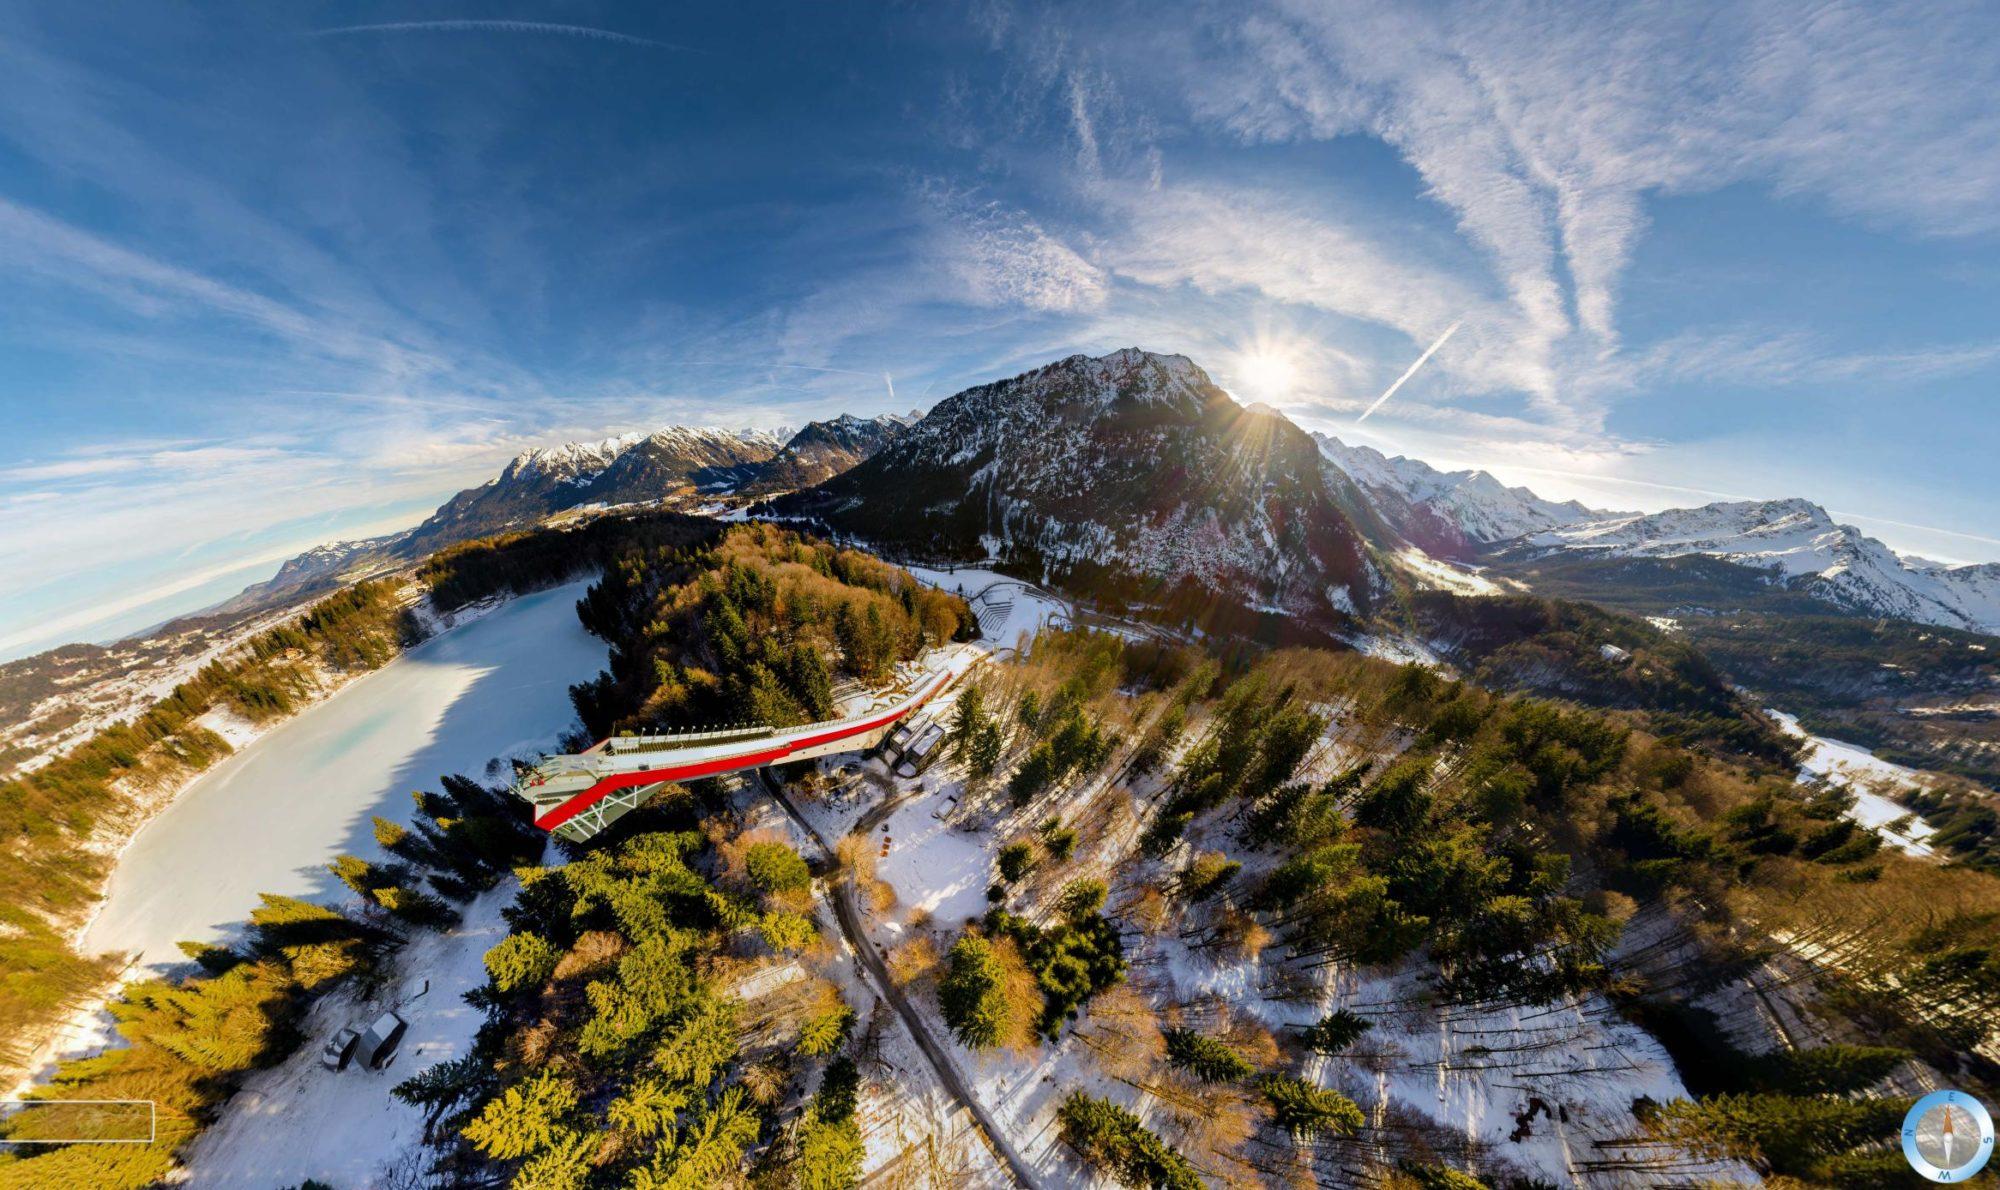 AeroFotografie